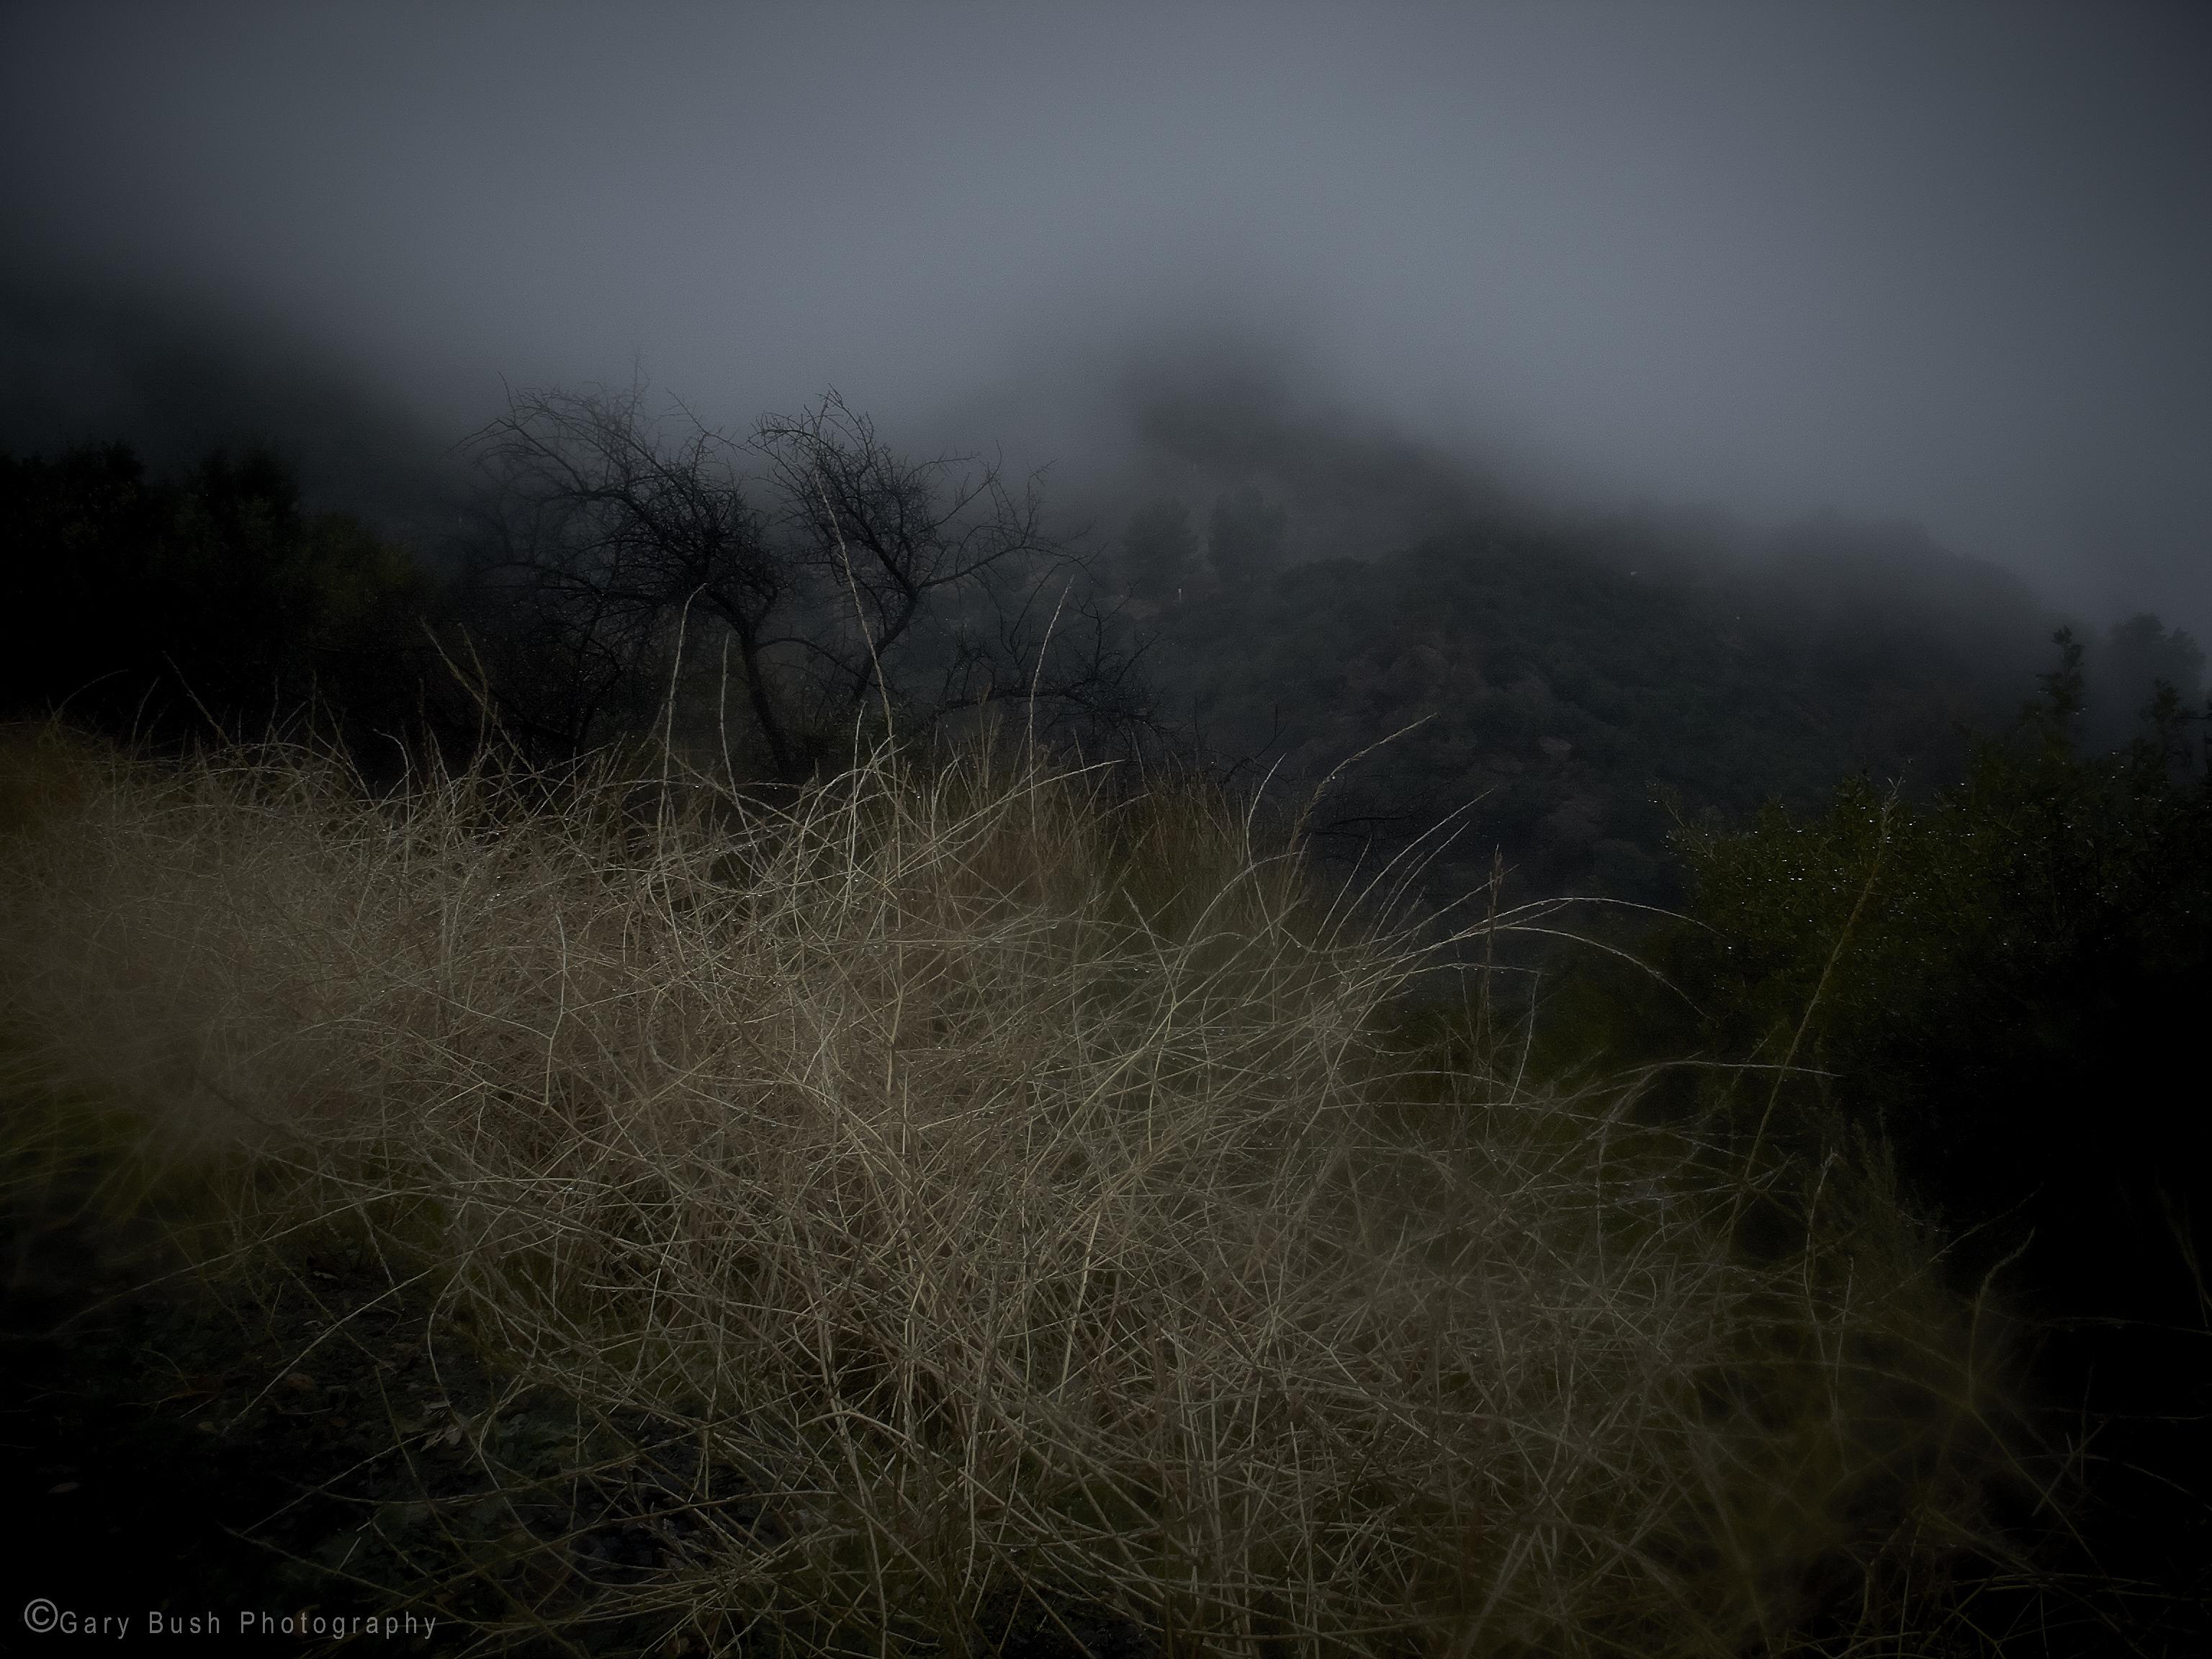 Dry Grass in Rain